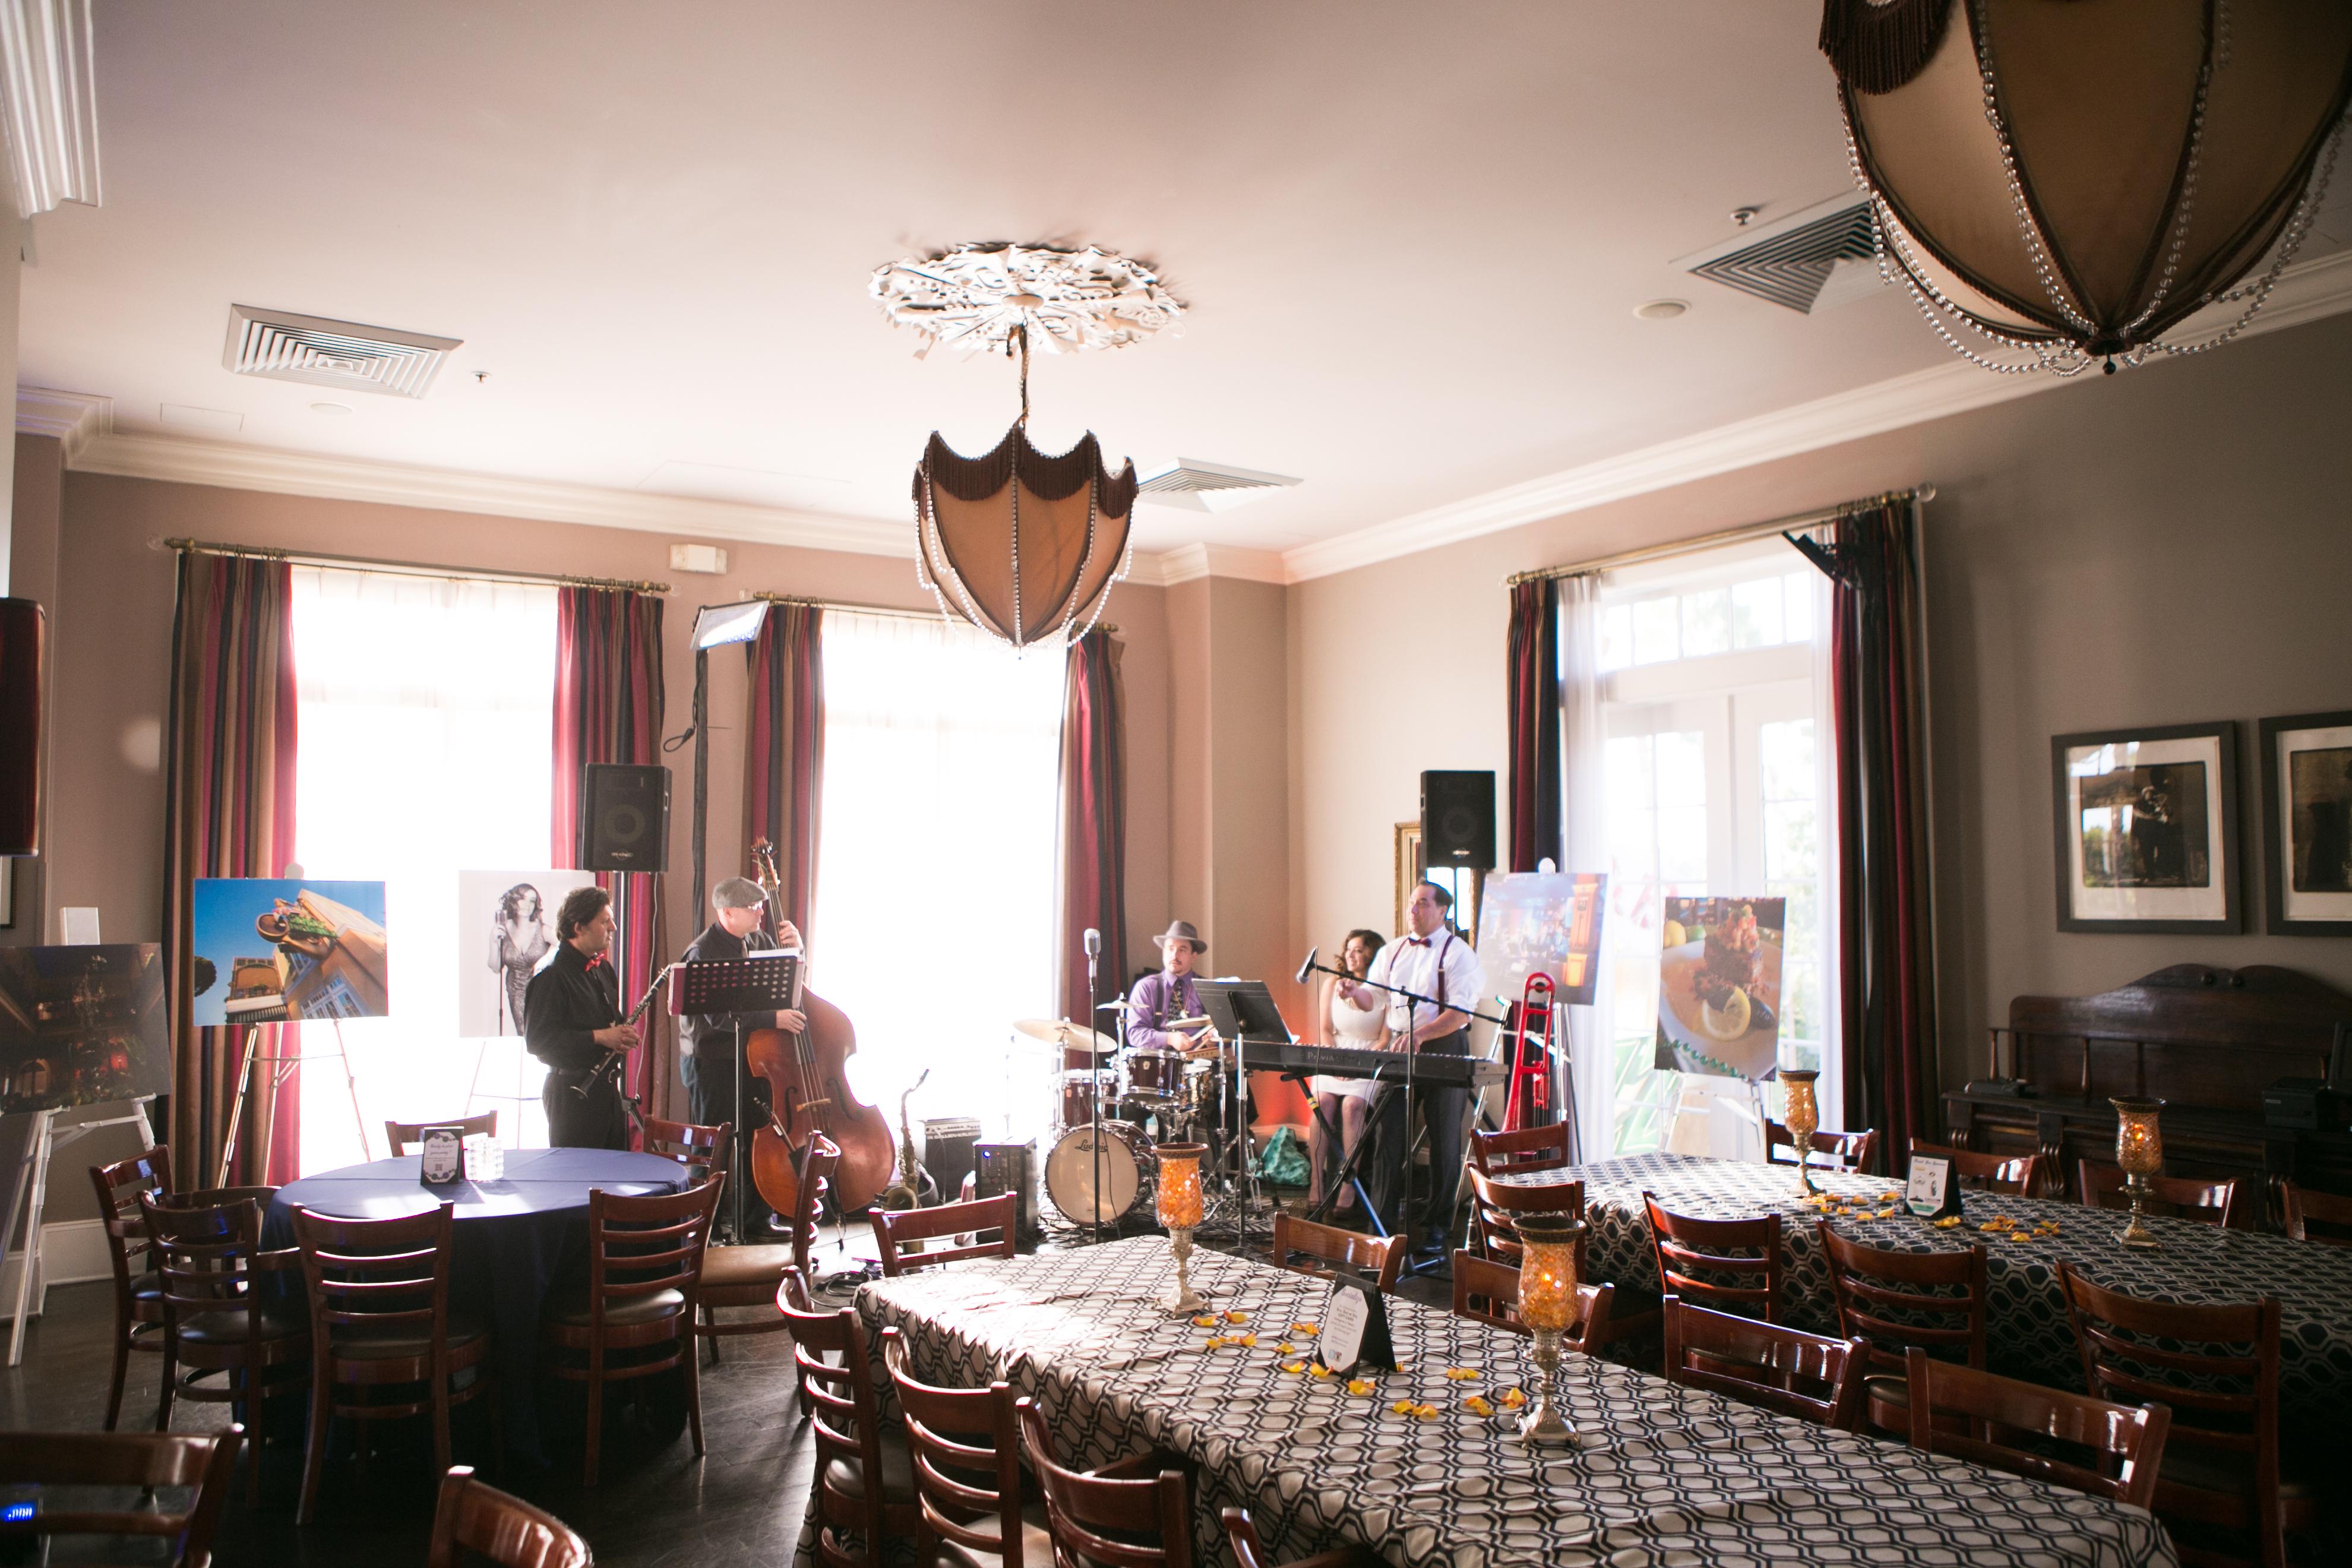 Ralph Brennans Jazz Kitchen Downtown Disney California Parlor Room |  DisneyExaminer